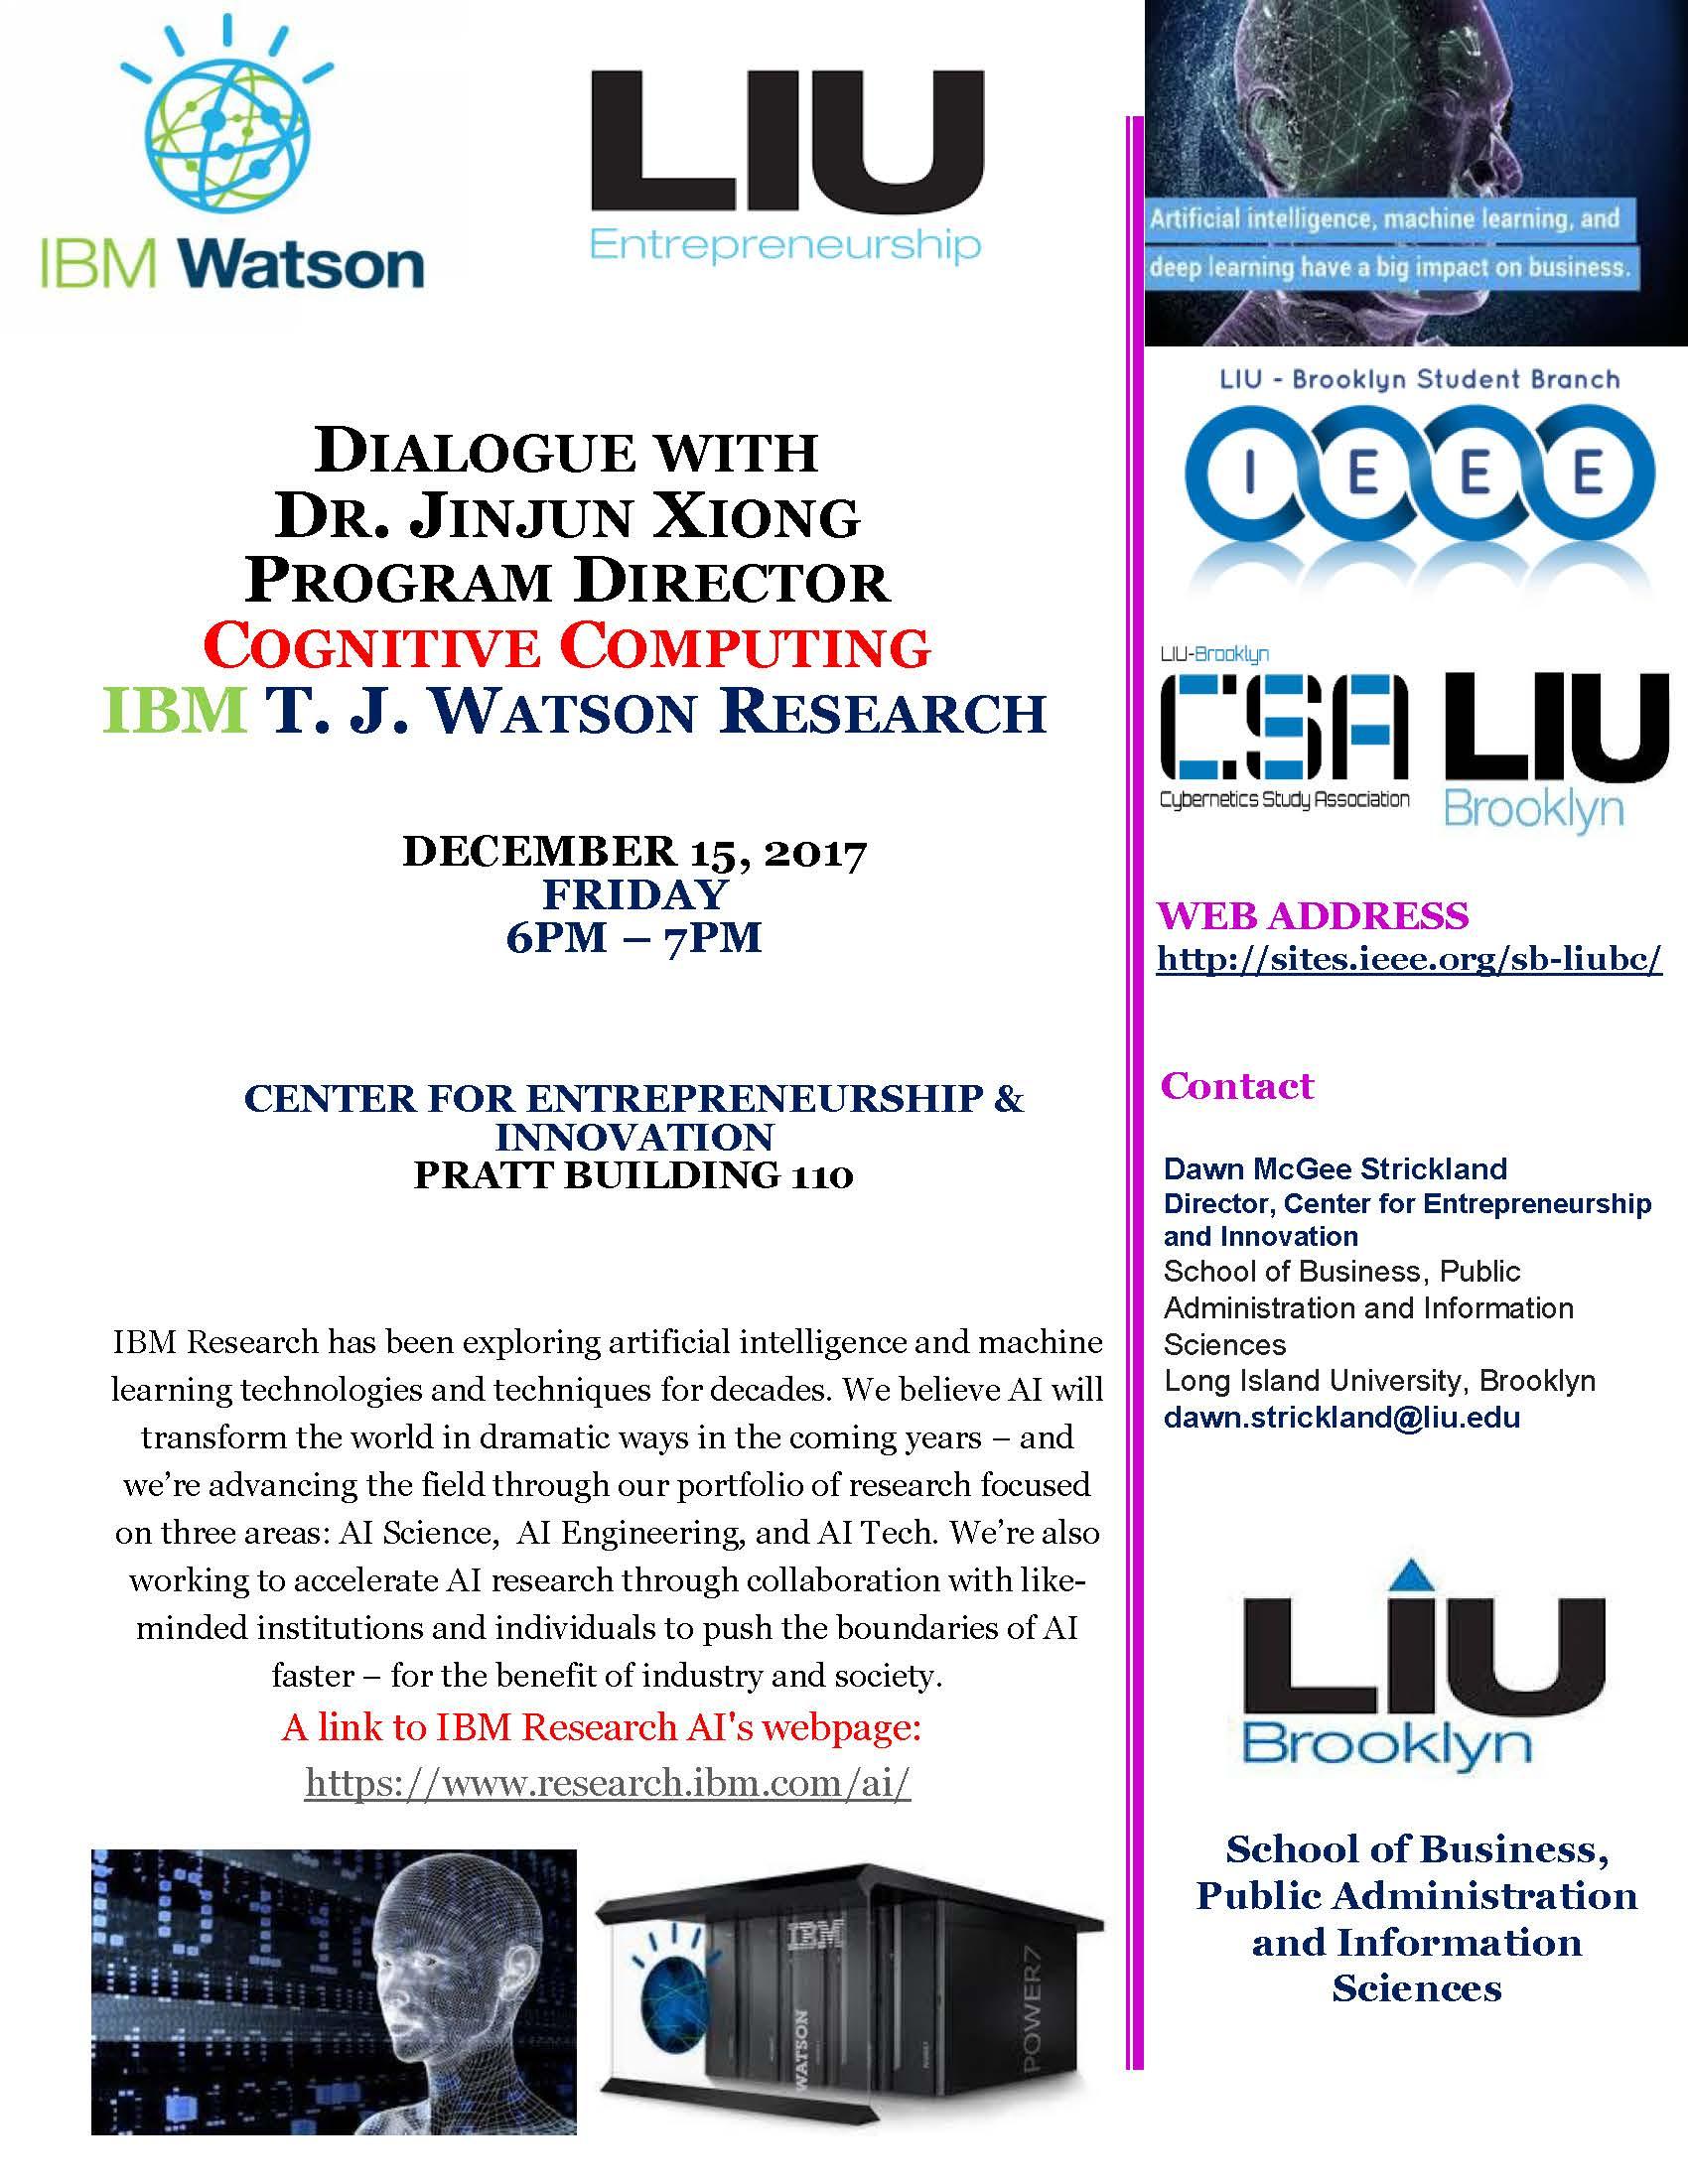 Cognitive_Computing-Dec15-event_Flyer.jpg